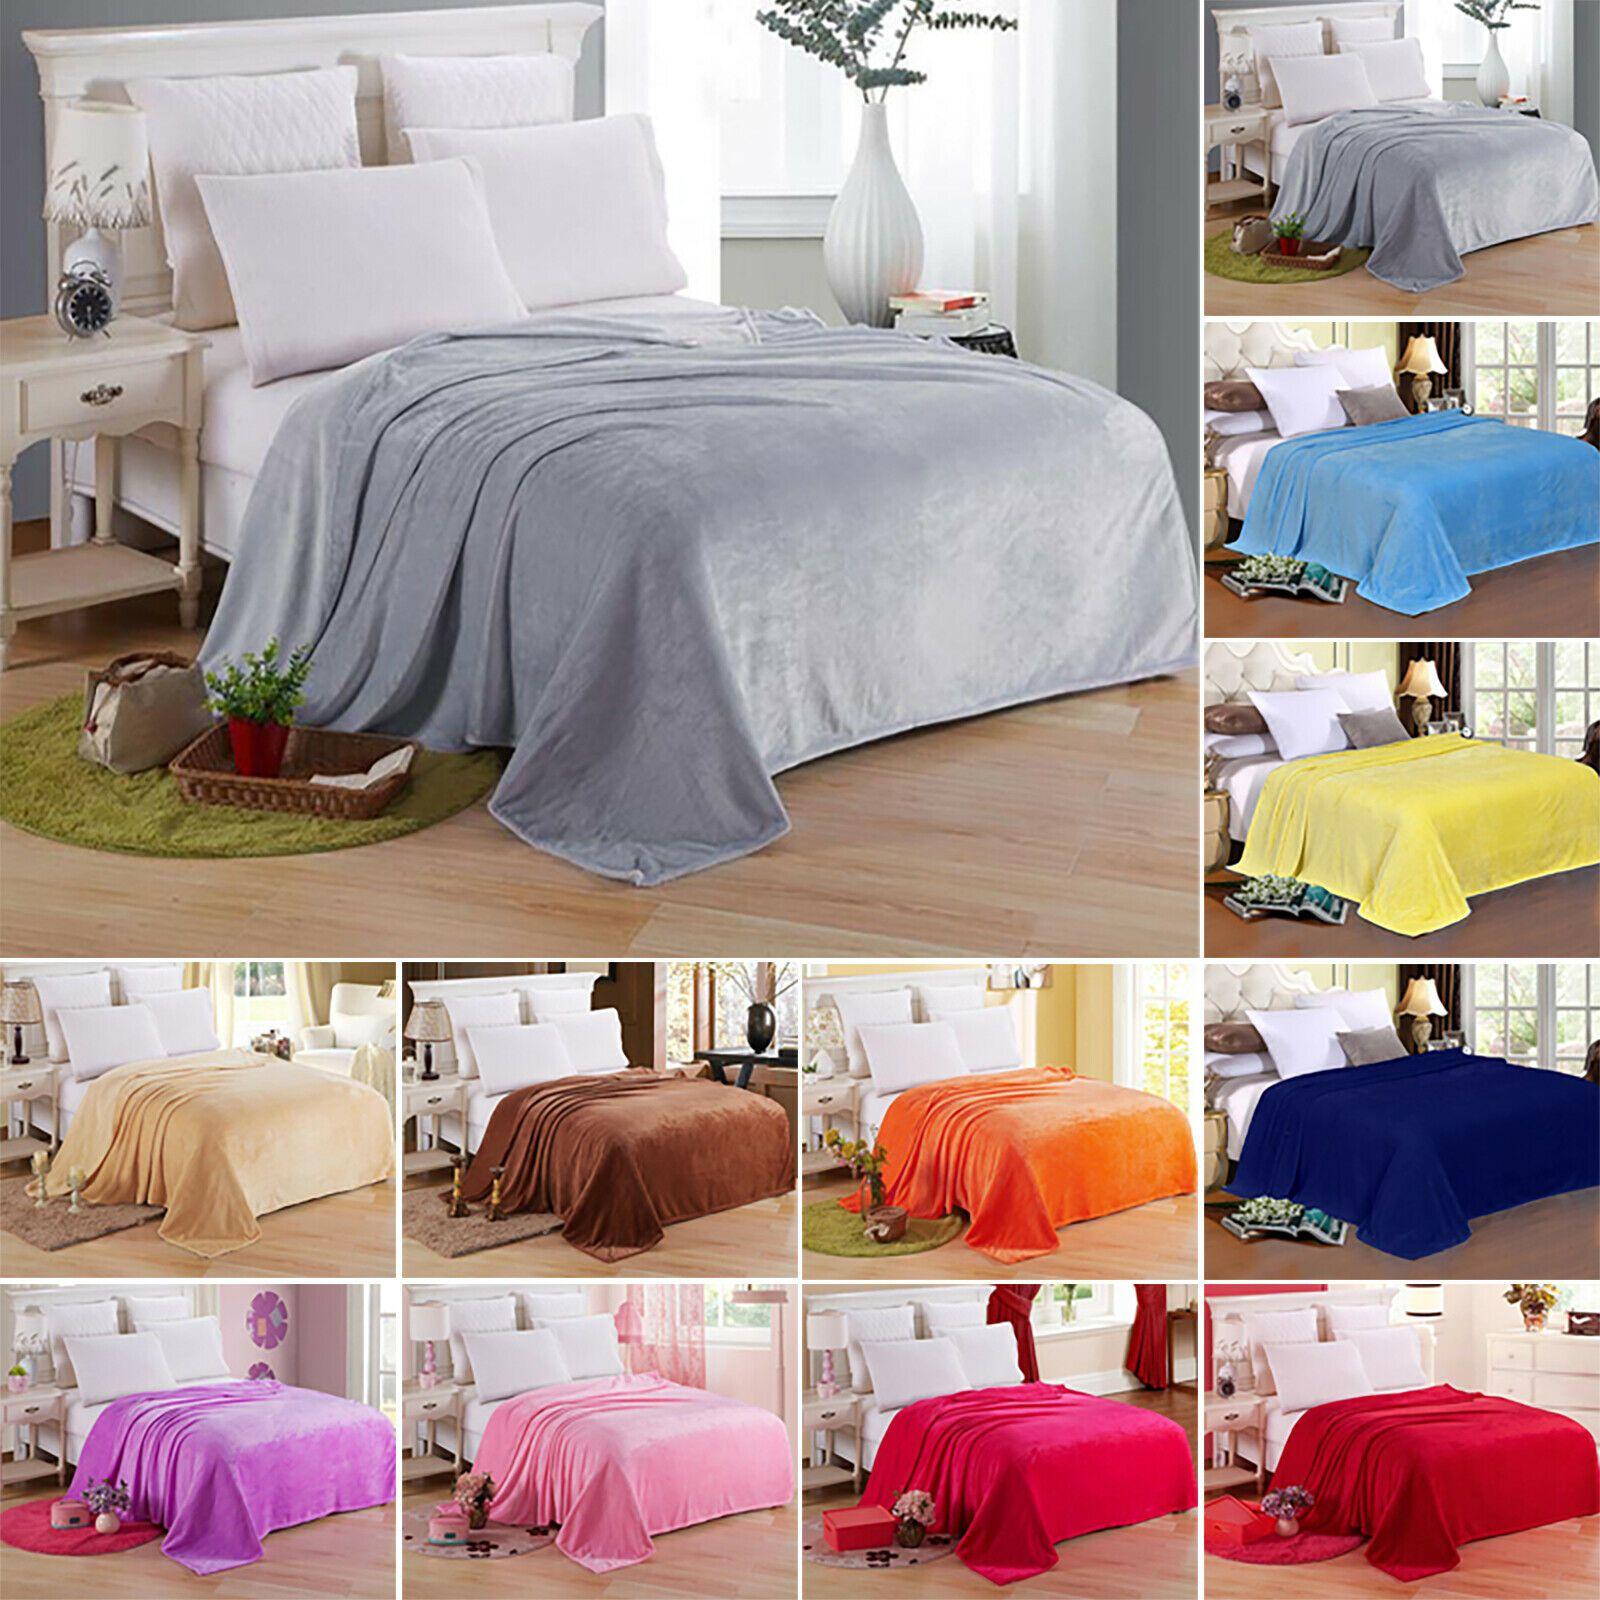 Luxury Soft Blanket Fleece Warm Throw Sofa Bed Flannel Single Double Queen King